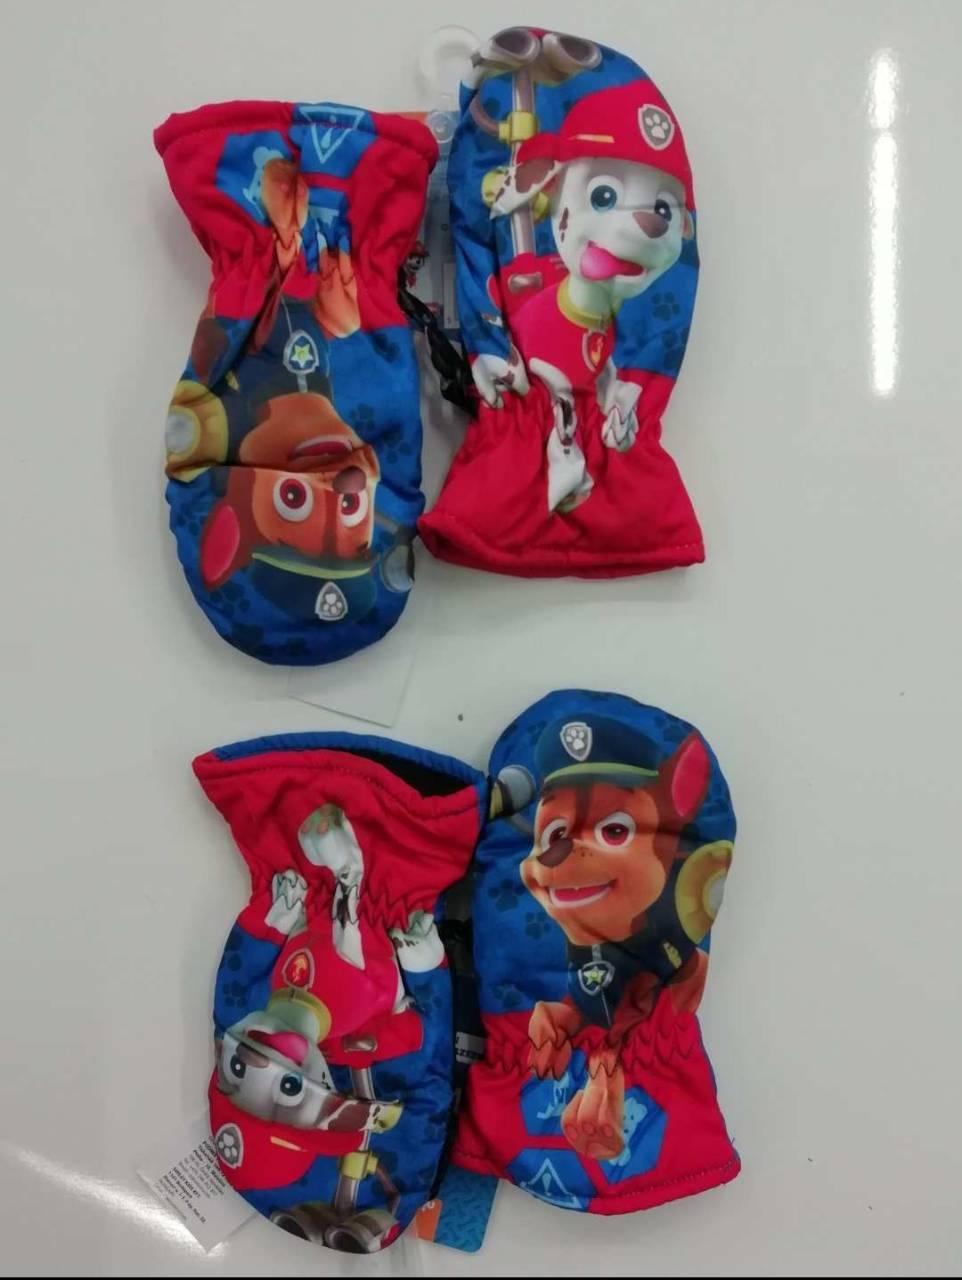 Варежки балоневые Disney для мальчиков оптом, арт.800-552